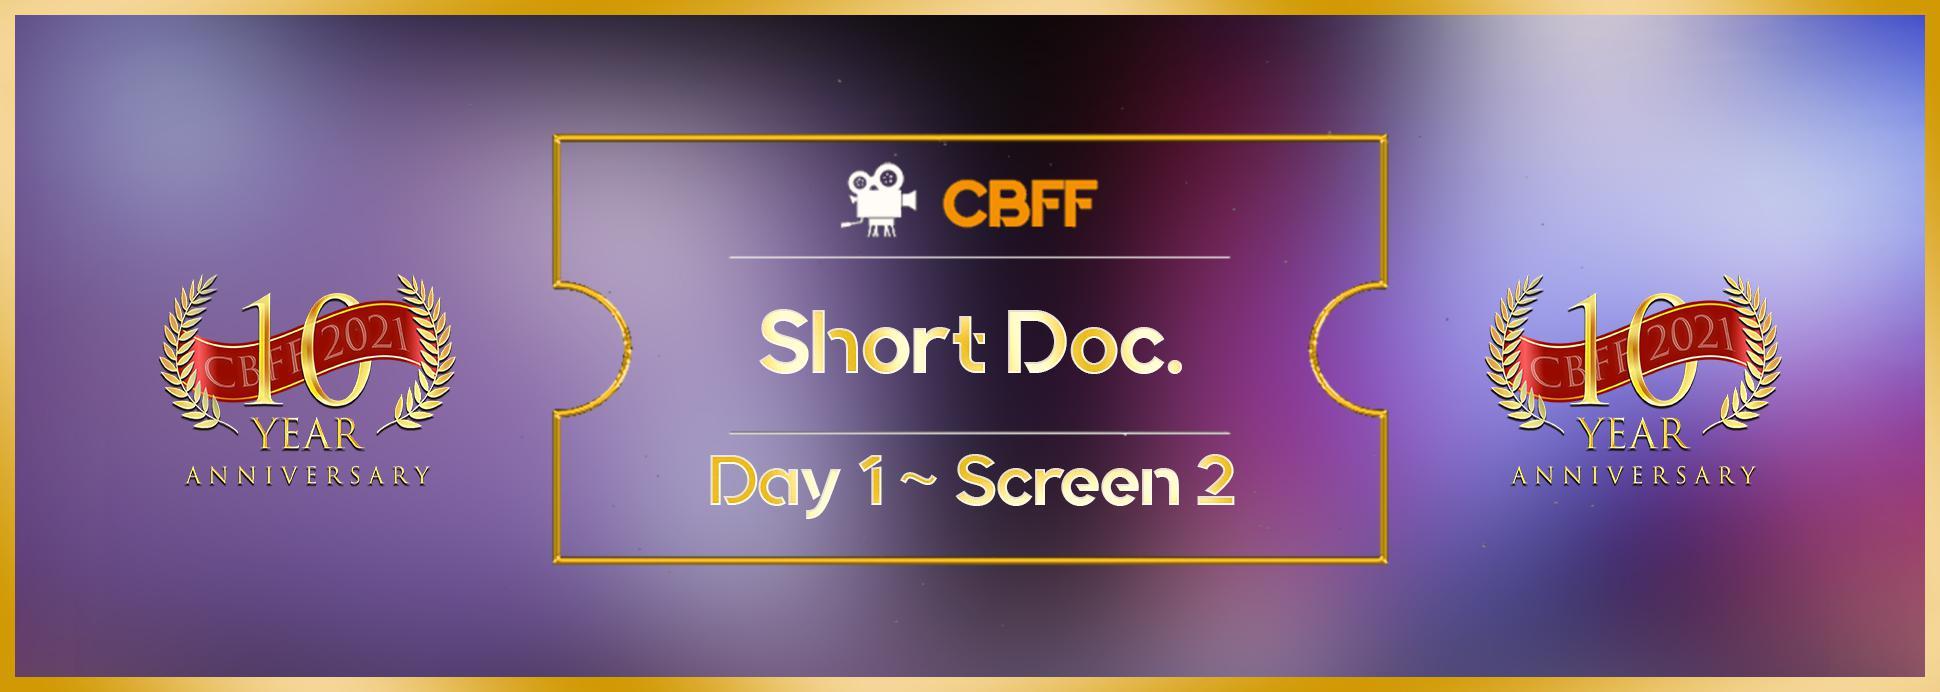 Day 1, Screen 2: Short Doc.